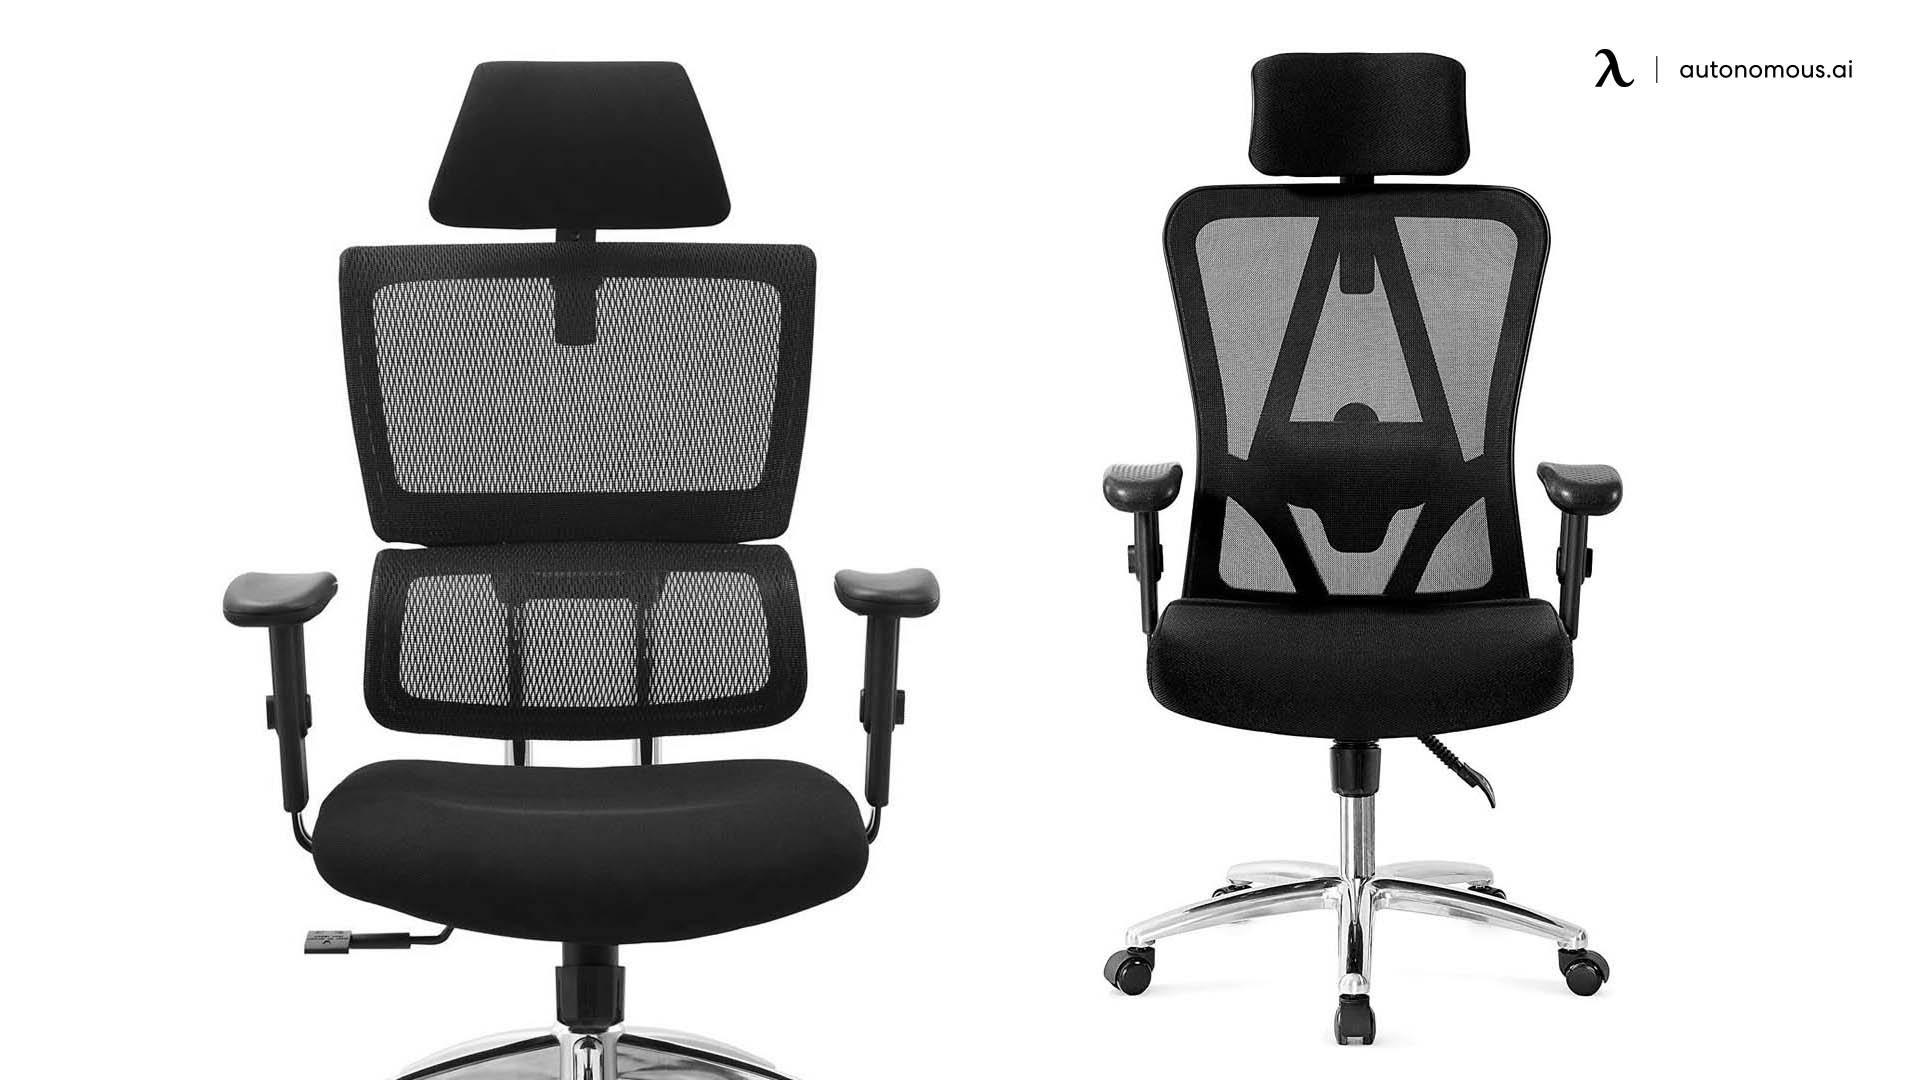 Tivoca Ergonomic Chair for Back Pain